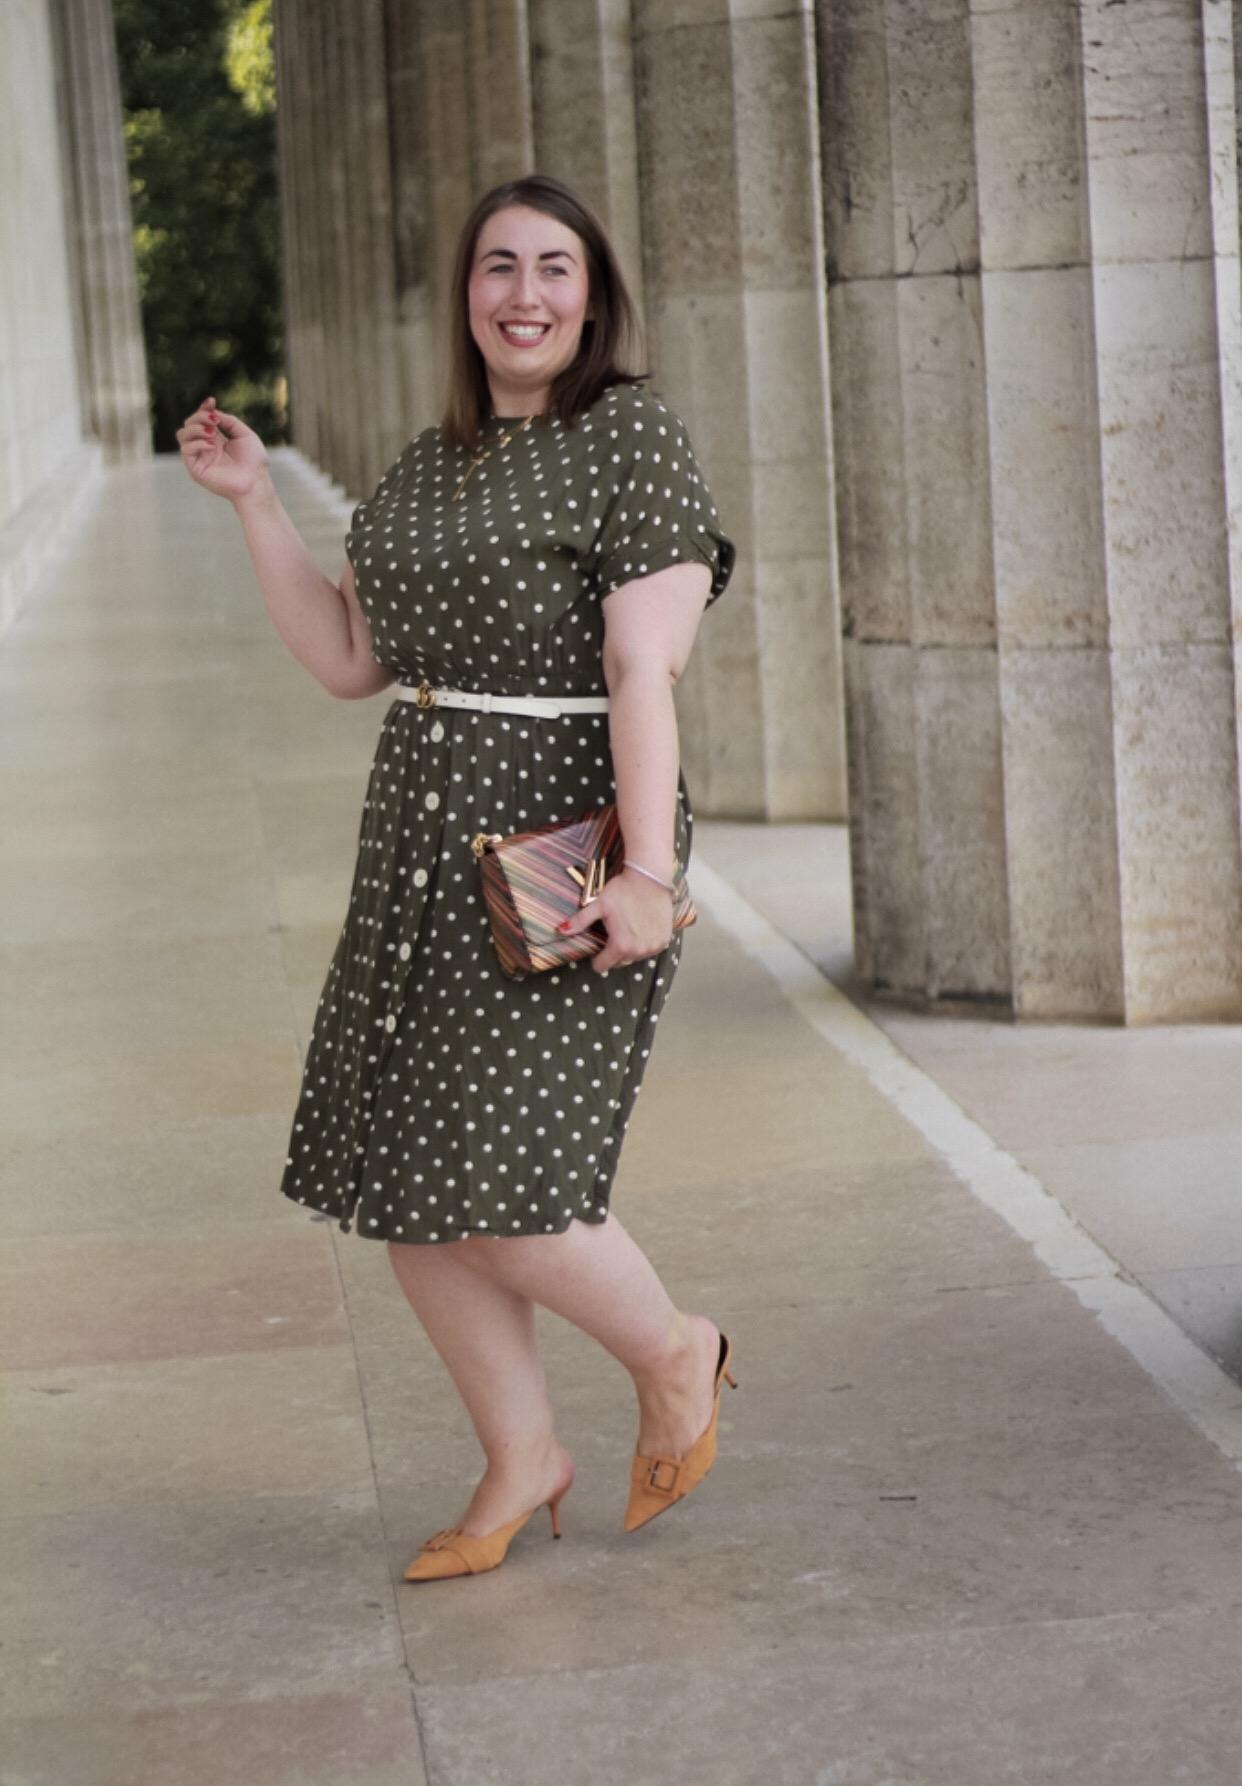 Bloggerparade-Polka-Dots-Miss-Suzie-Loves-Susanne-Heidebach-Walhalla-Regensburg-Violeta-Mango-Midikleid-dunkelgrün-Louis-Vuitton-Twist